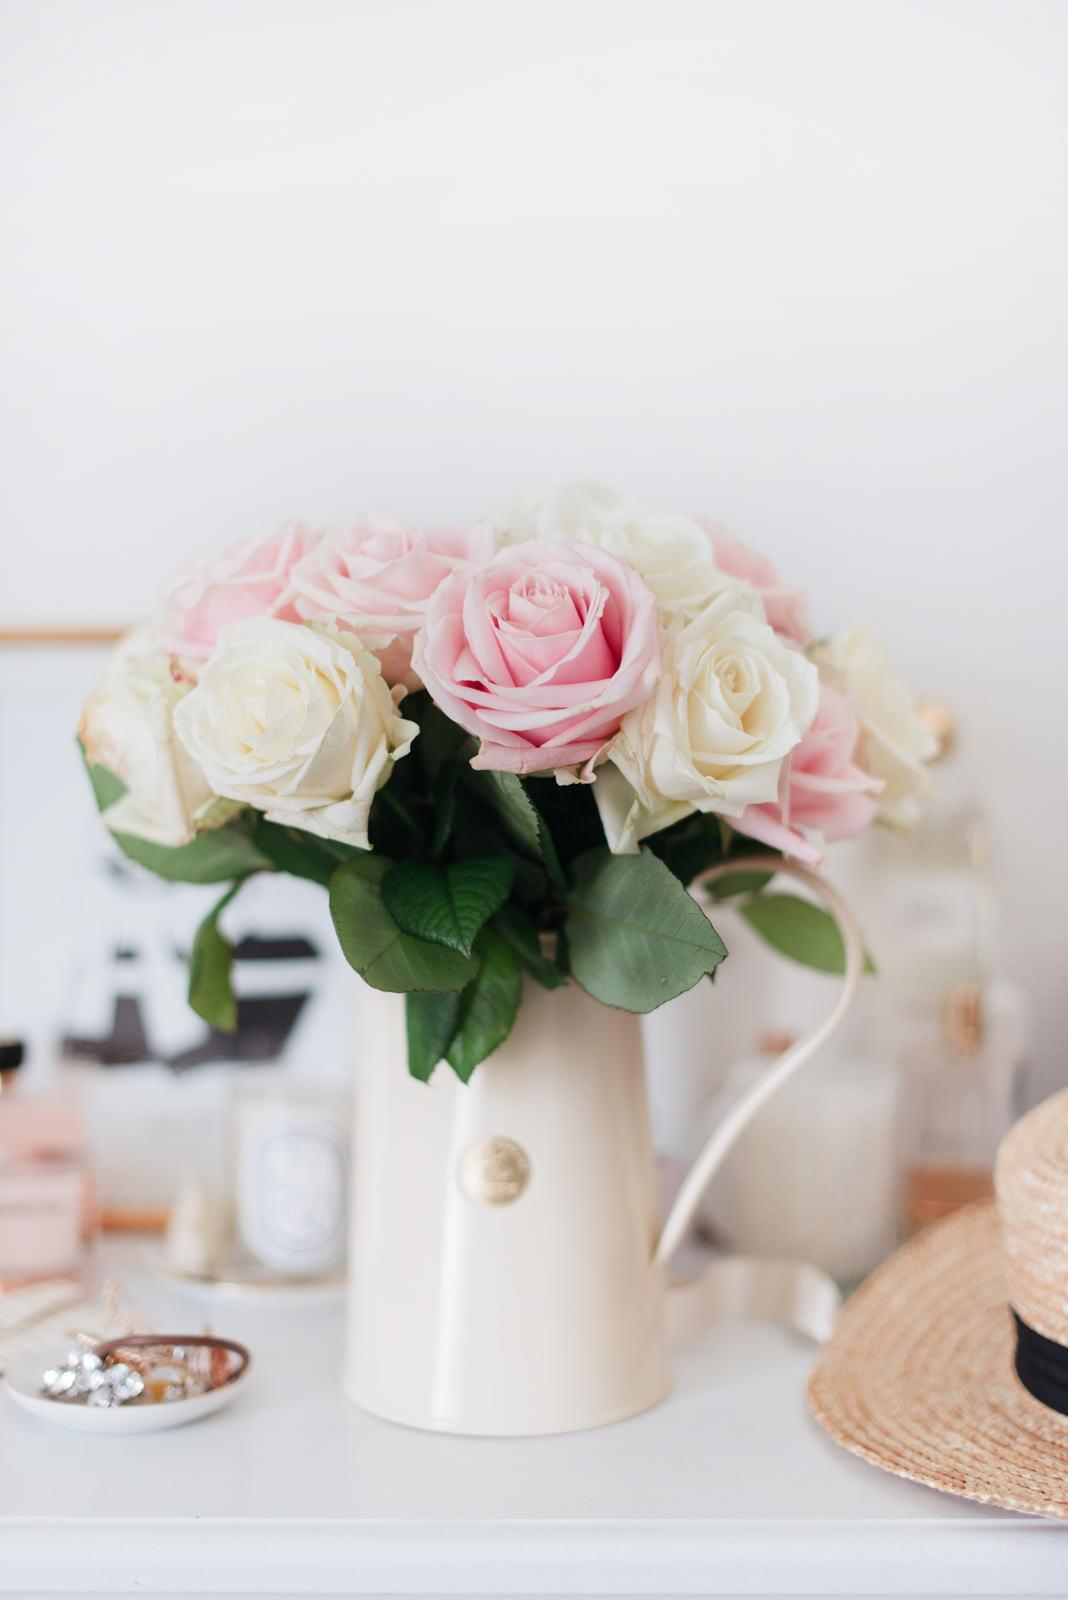 Blog-Mode-And-The-City-Lifestyle-Cinq-Petites-Choses-212-bouquet-bergamotte